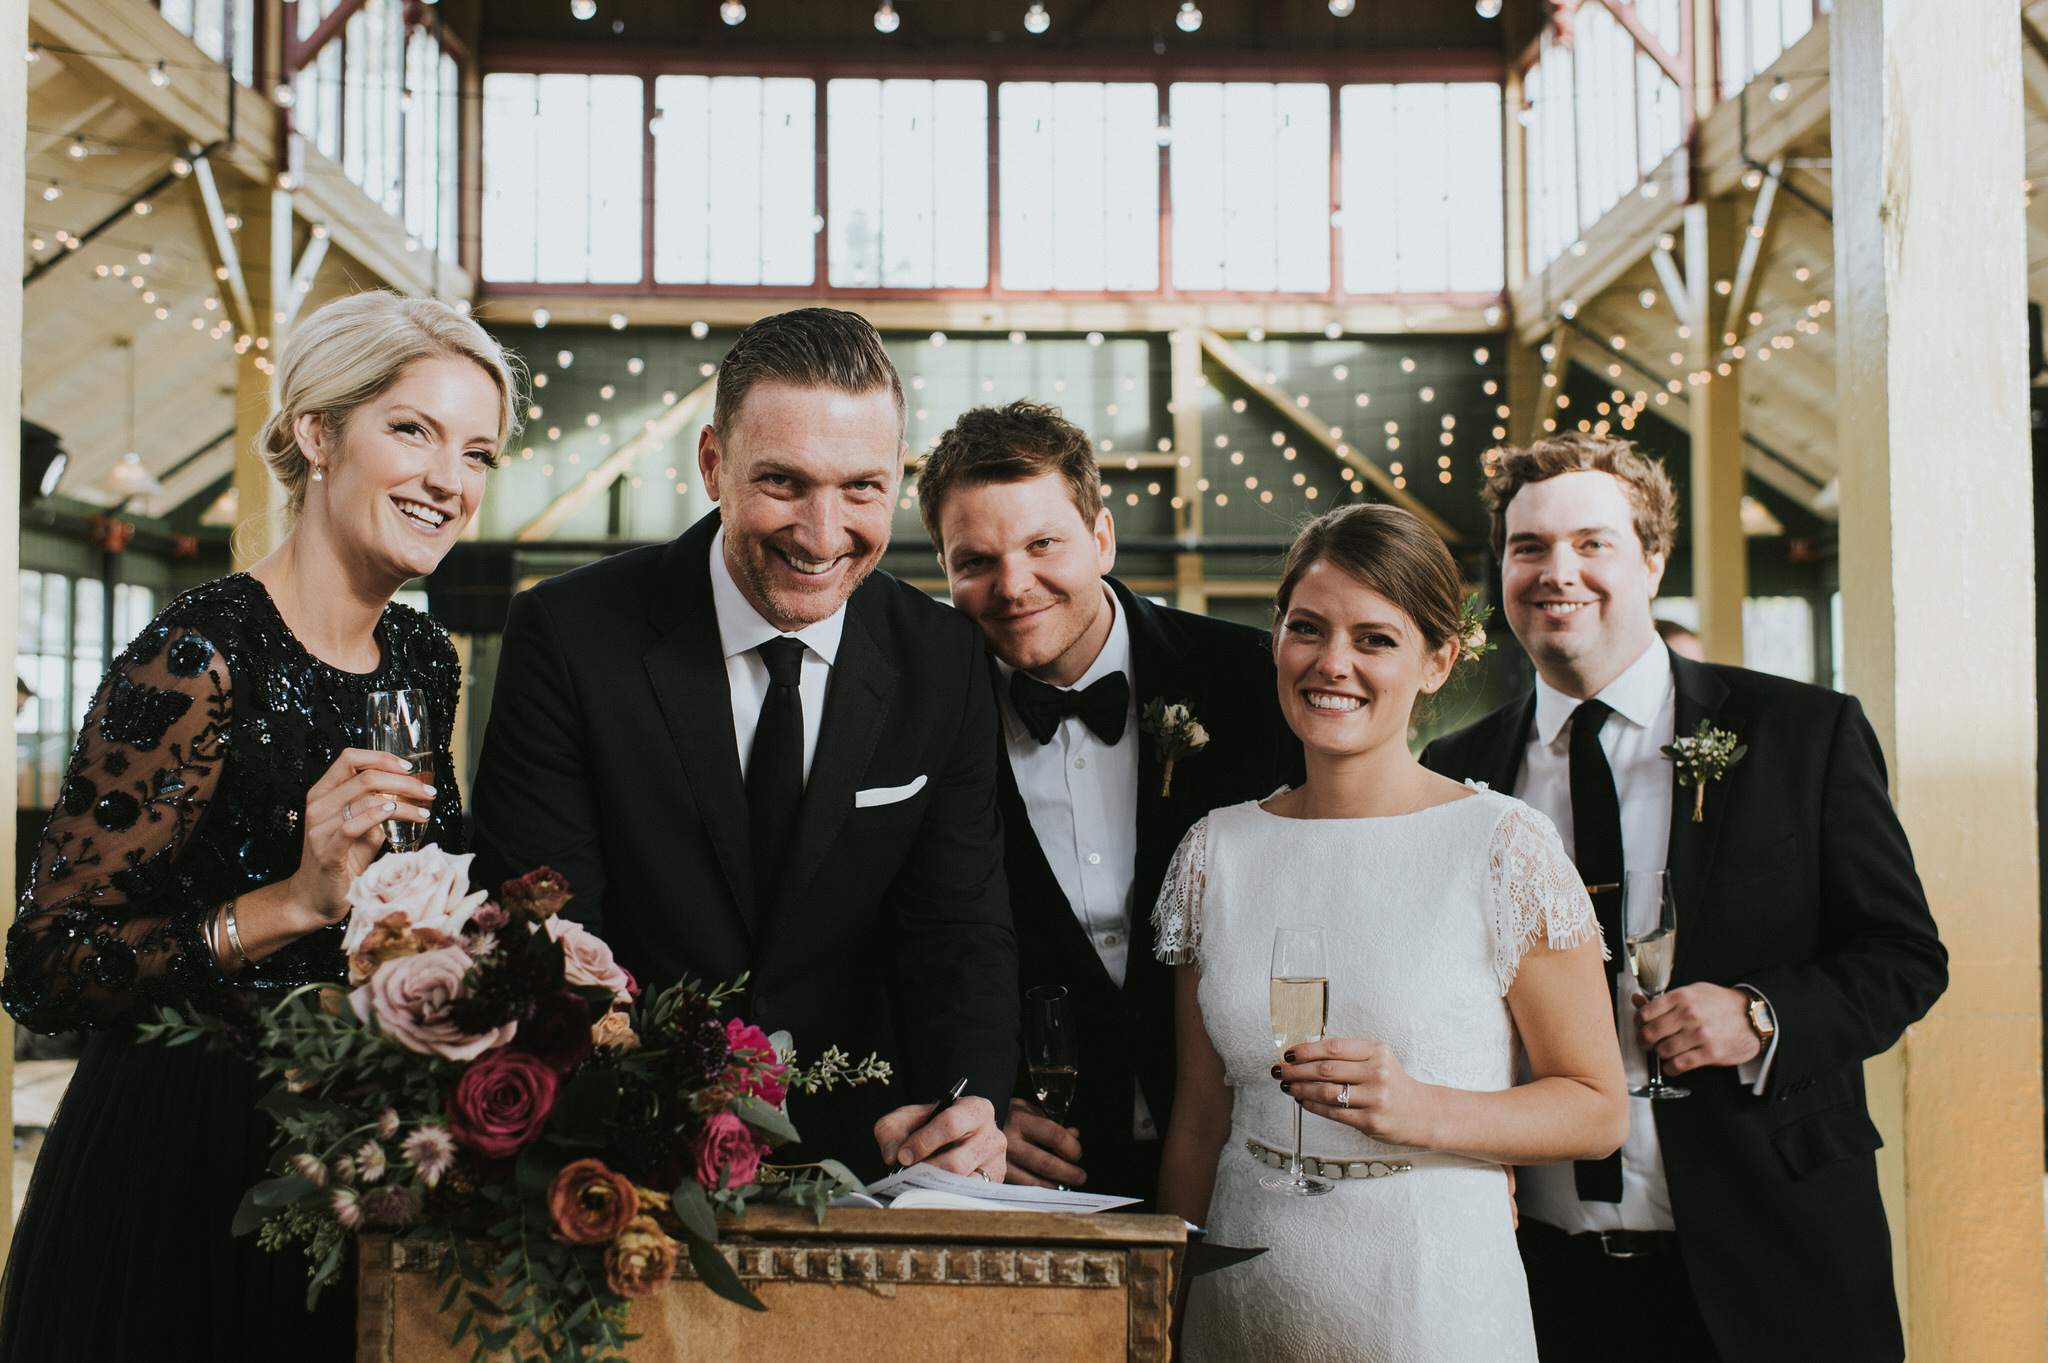 scarletoneillphotography_weddingphotography_prince edward county weddings129.JPG